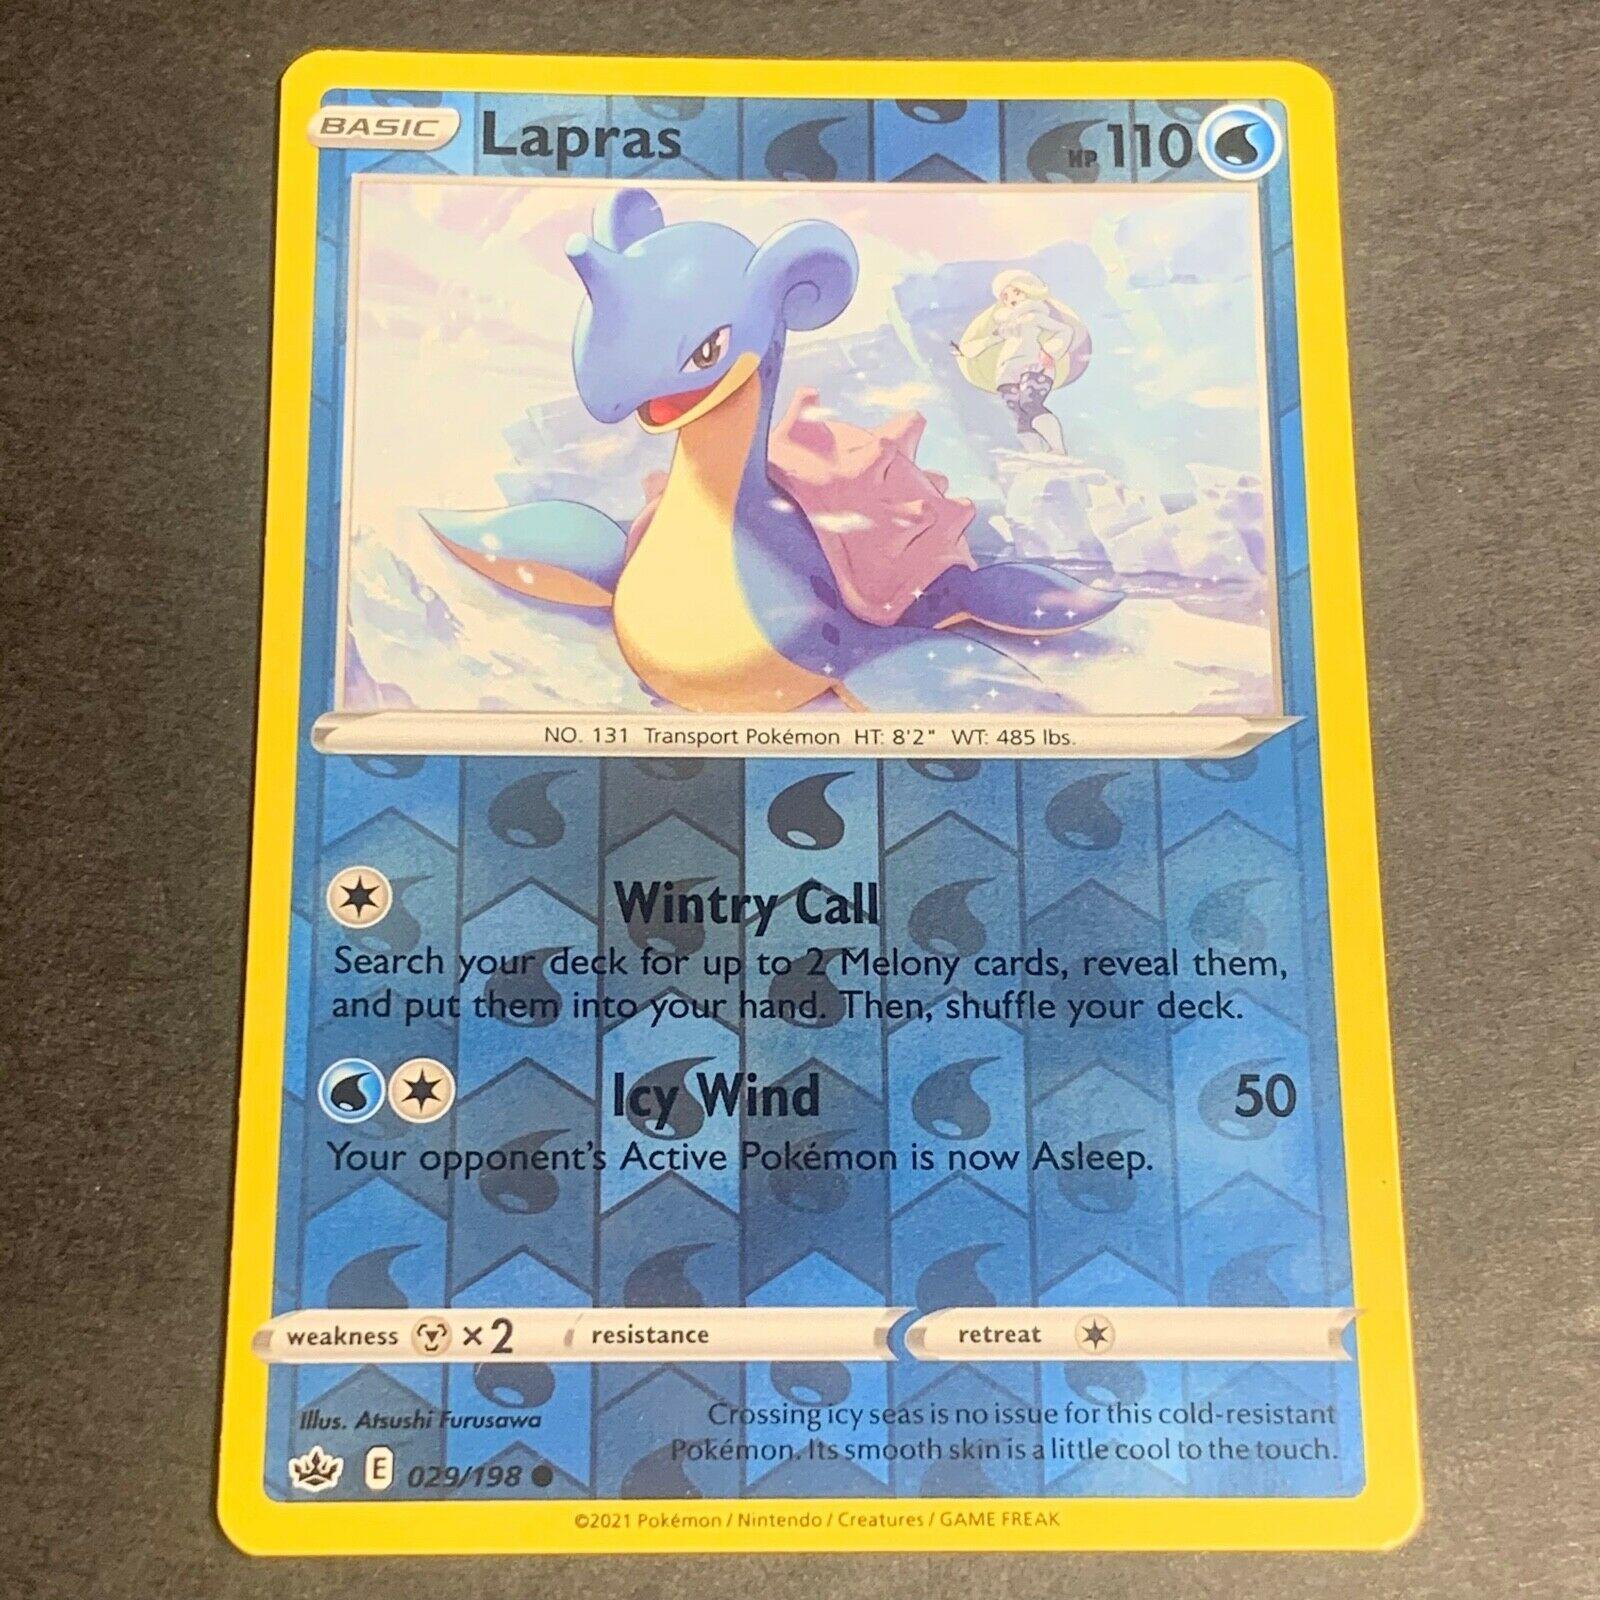 Pokemon S&S Chilling Reign Set REVERSE HOLO (C.) Lapras 029/198 - Near Mint (NM)